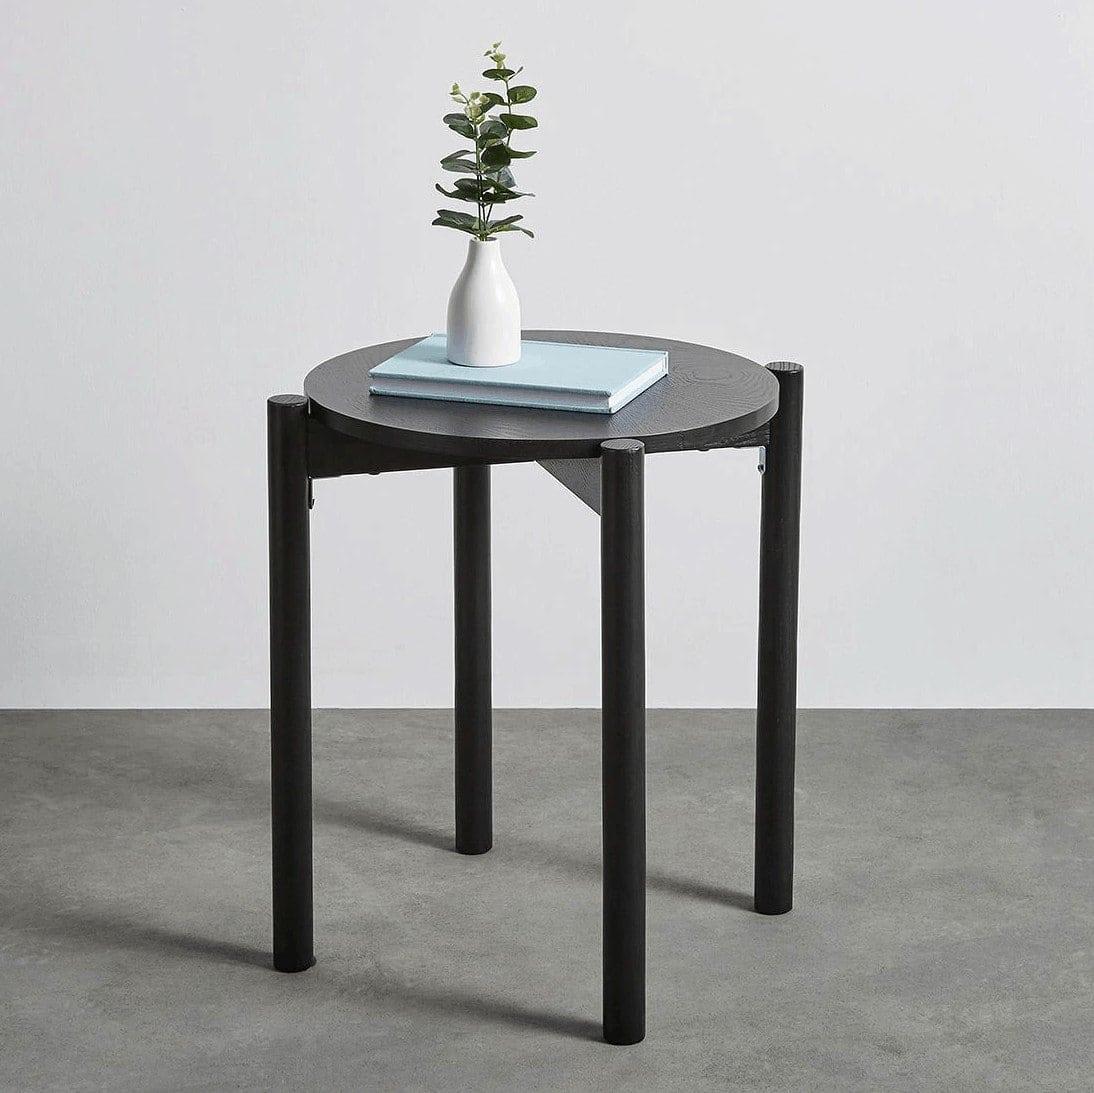 target maki side table affordable side tables for living room